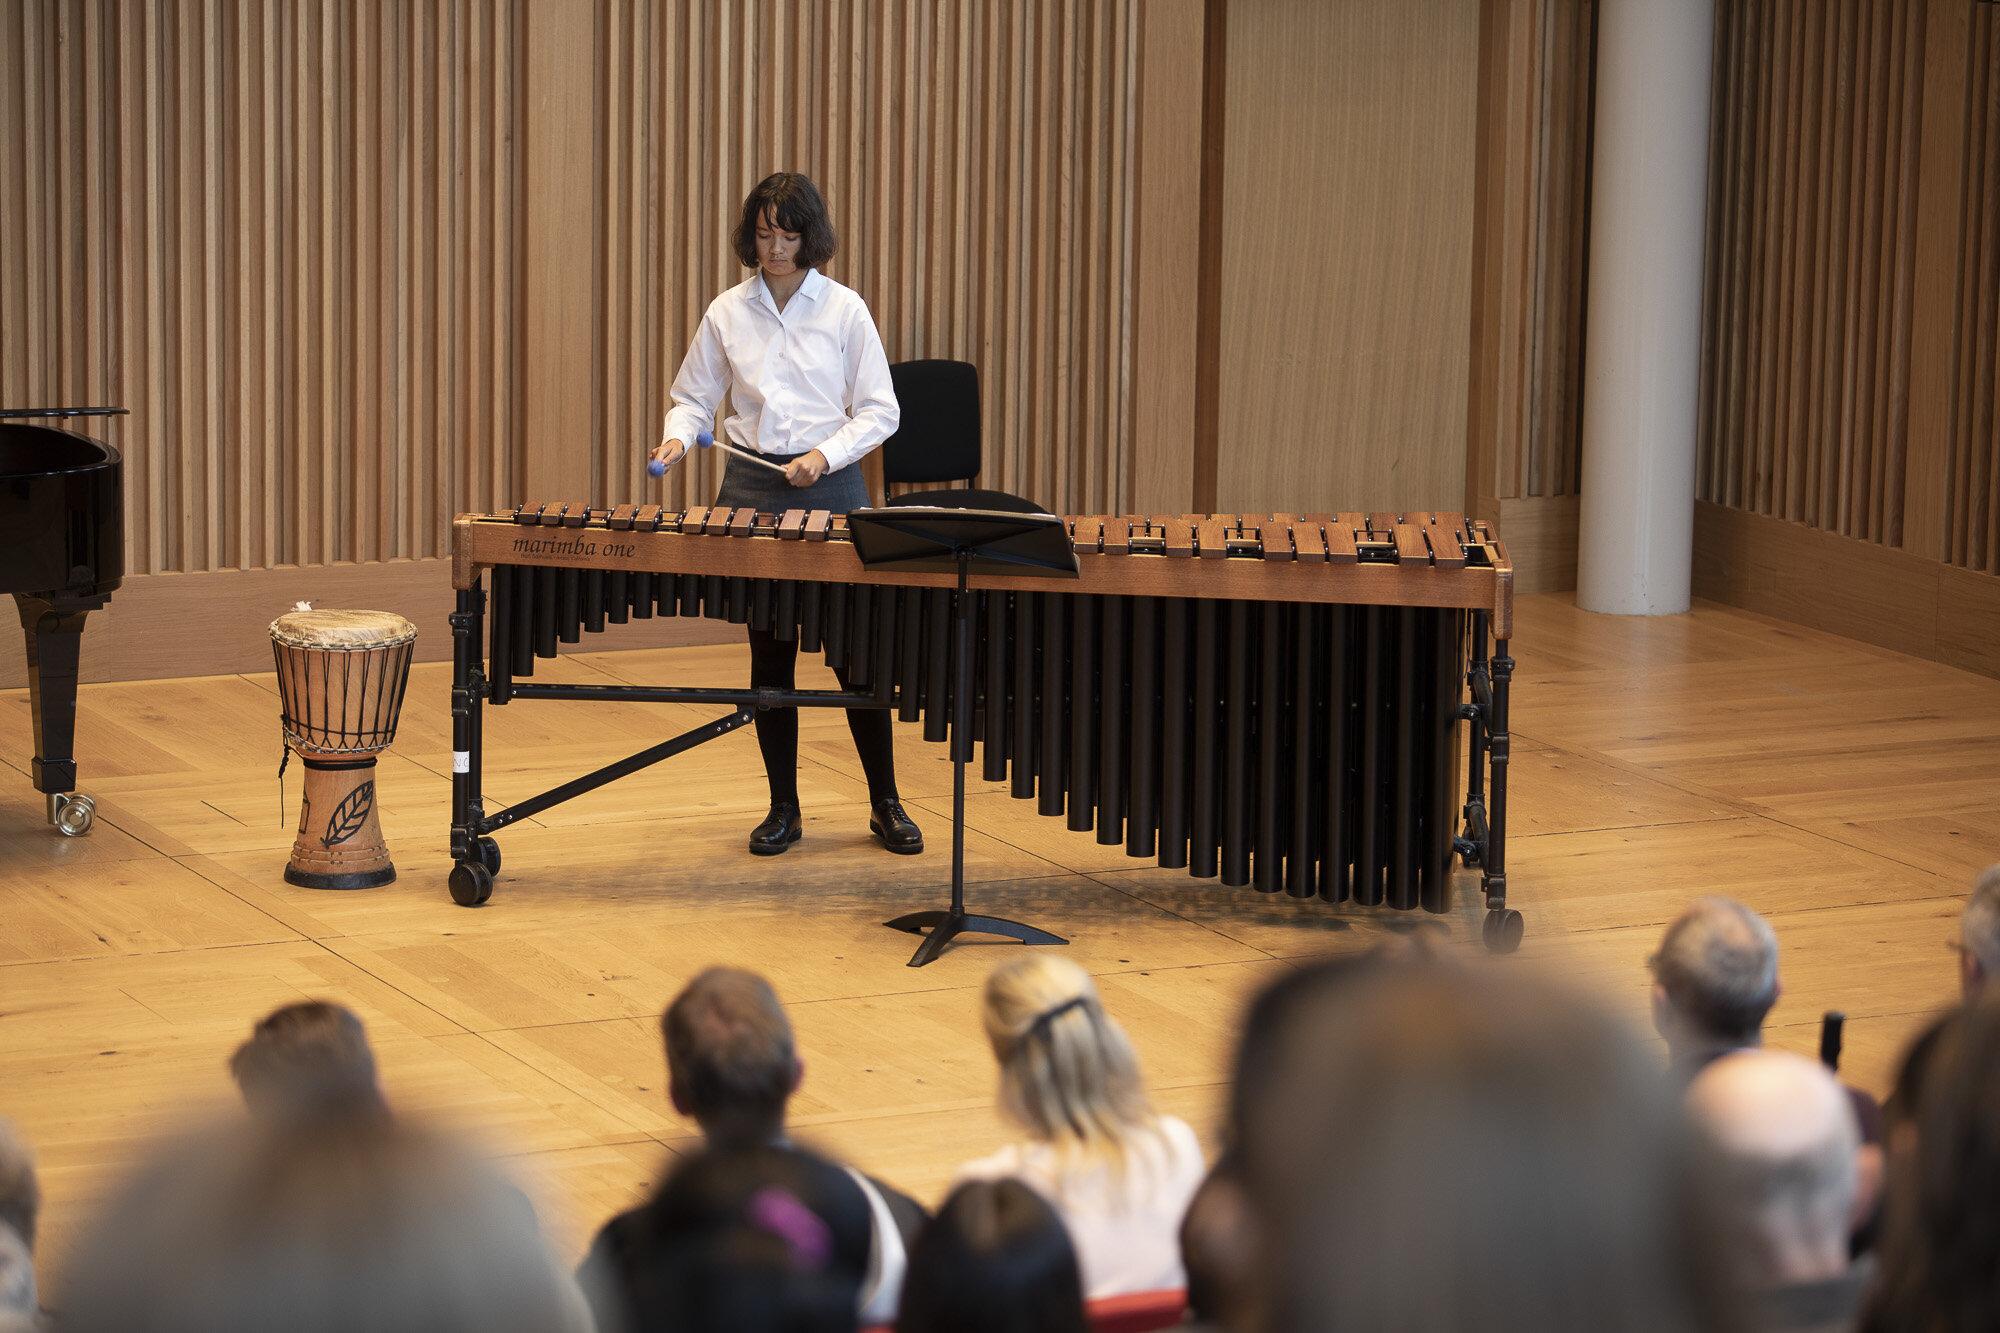 Chorister Sophie plays the marimba as part of the Royal Recital